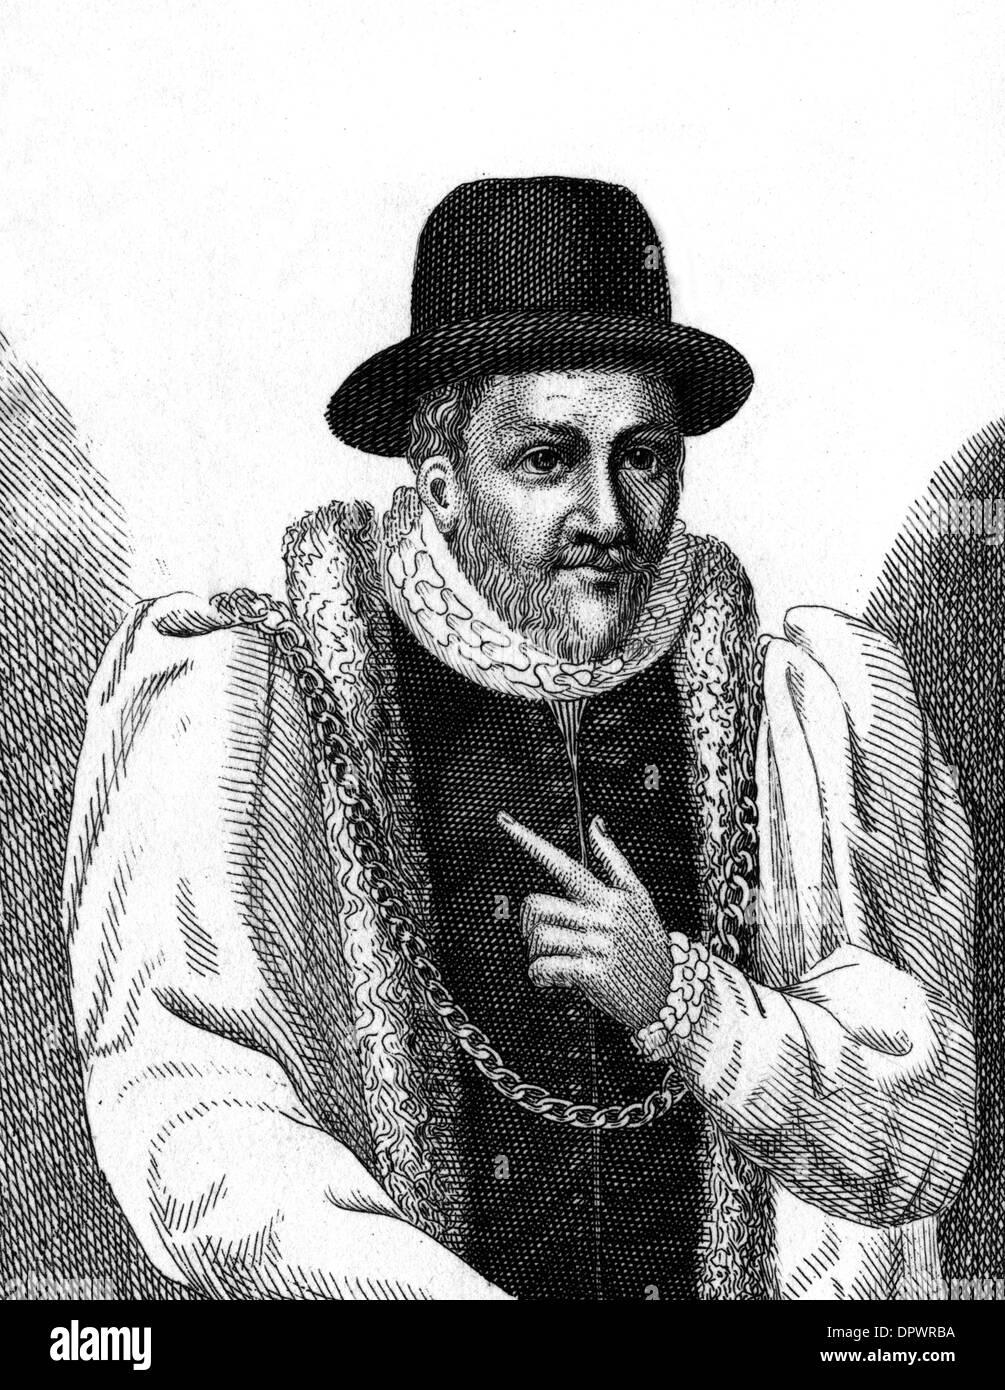 SIR WILLIAM RYDER - Stock Image